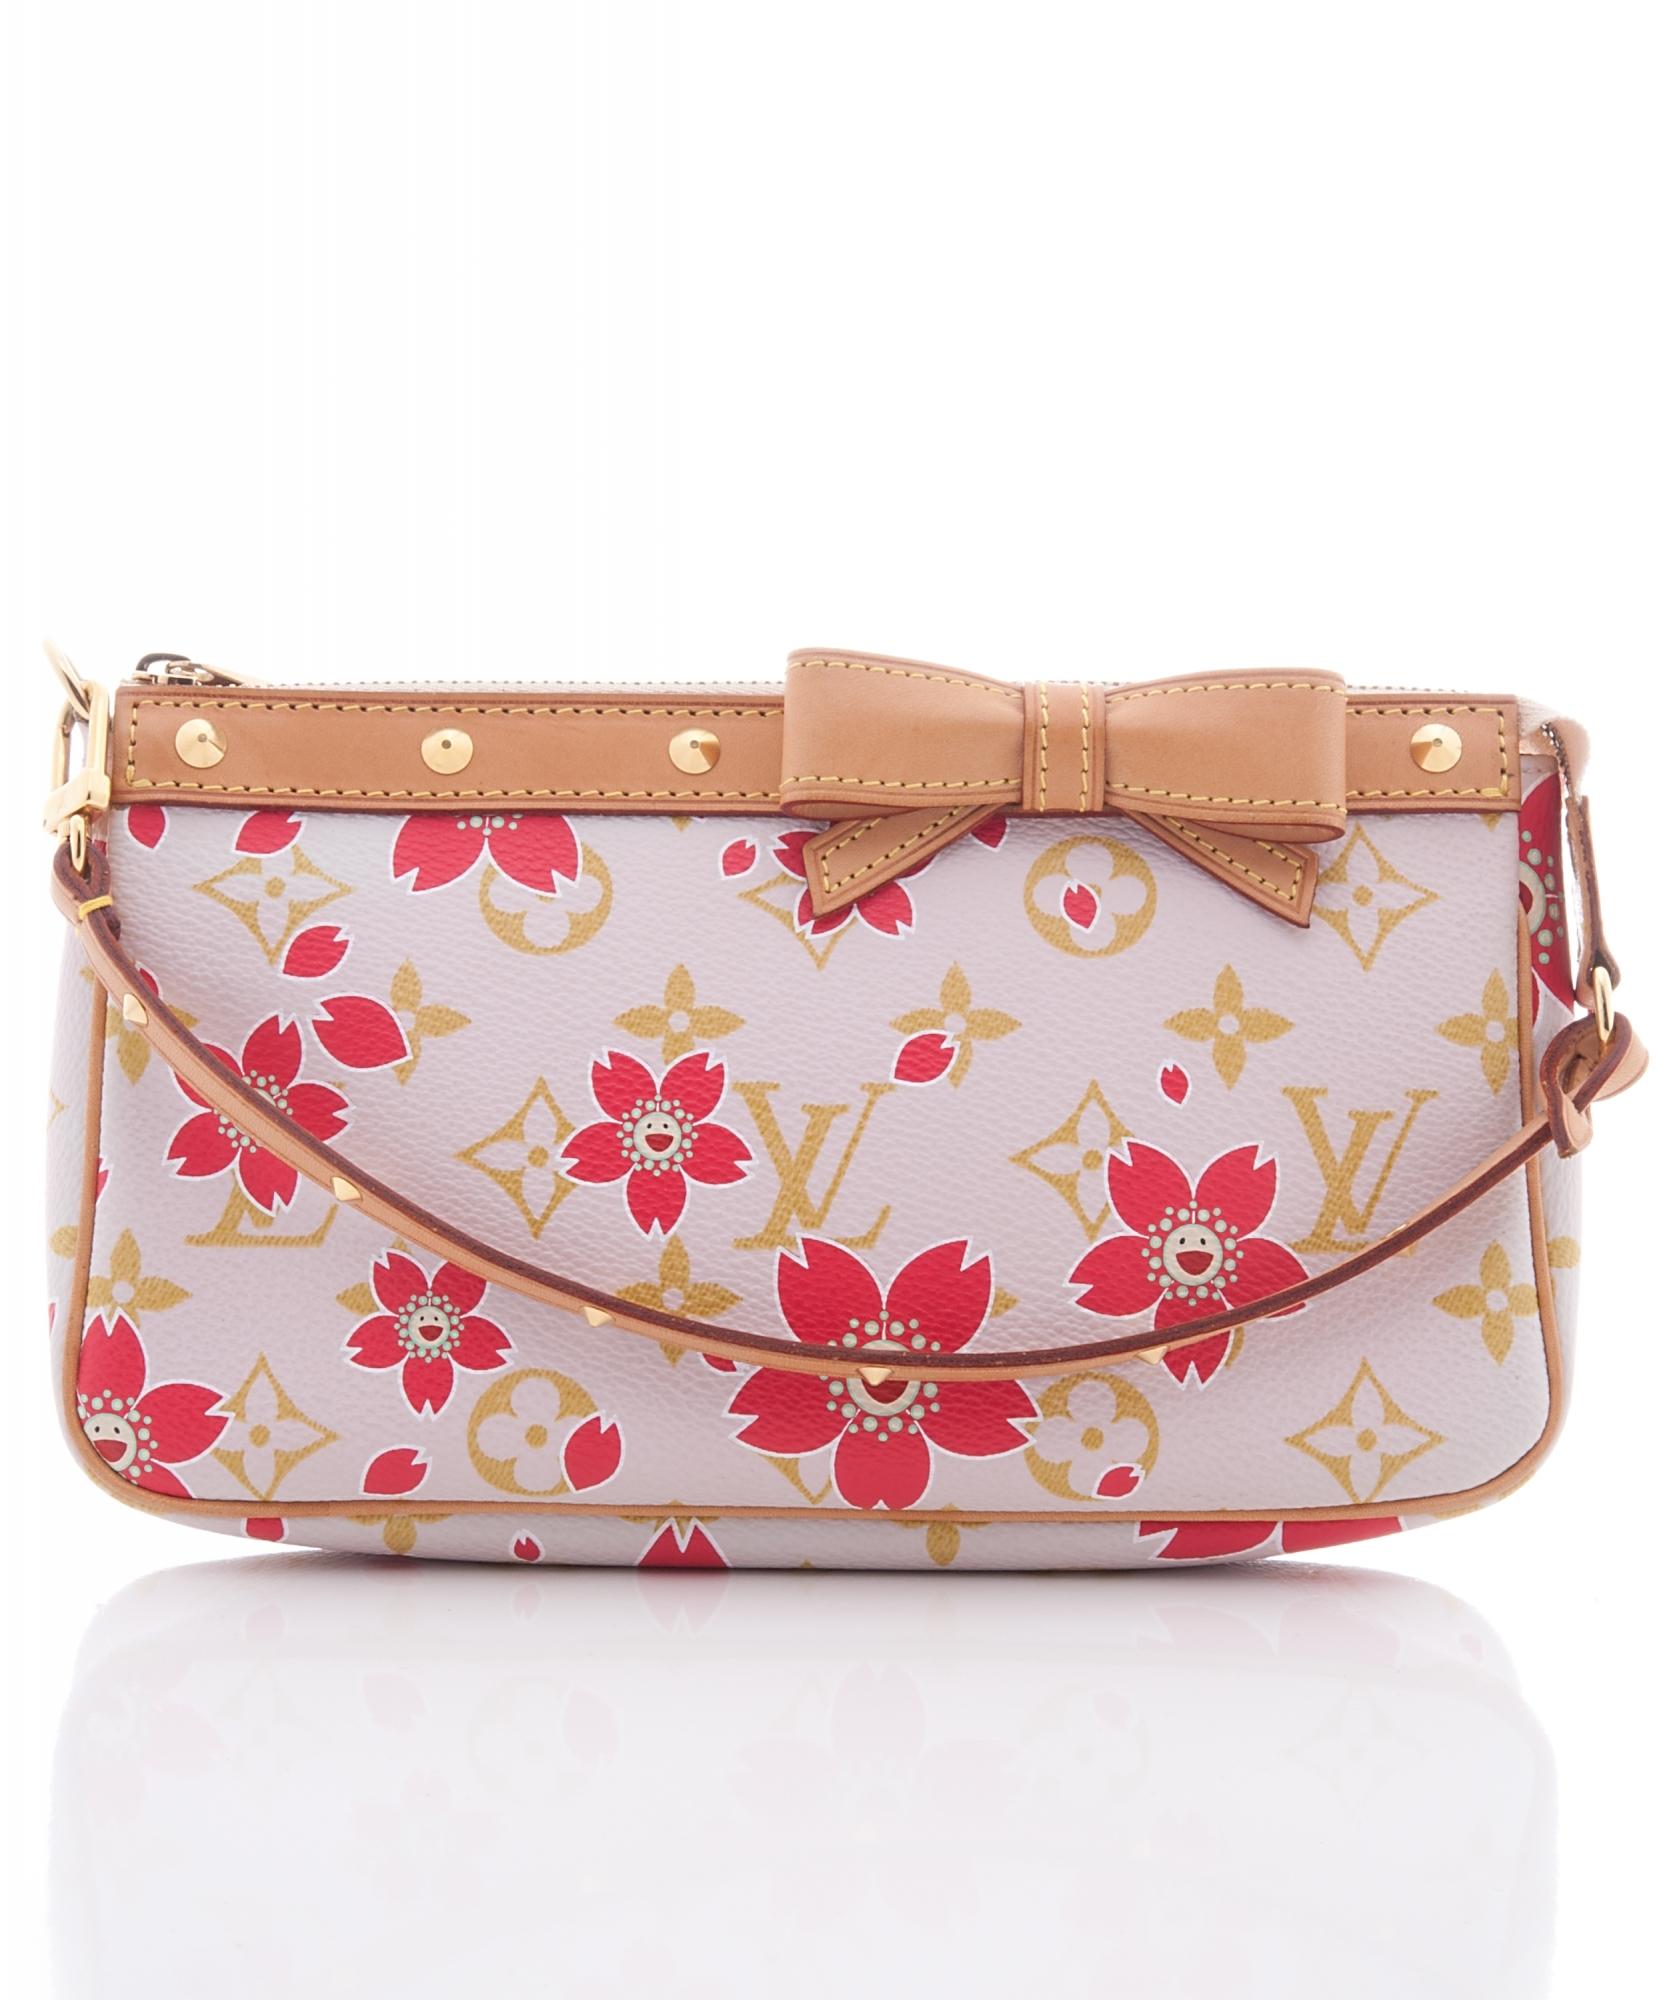 85efd0139ec Louis Vuitton Pochette Handbag